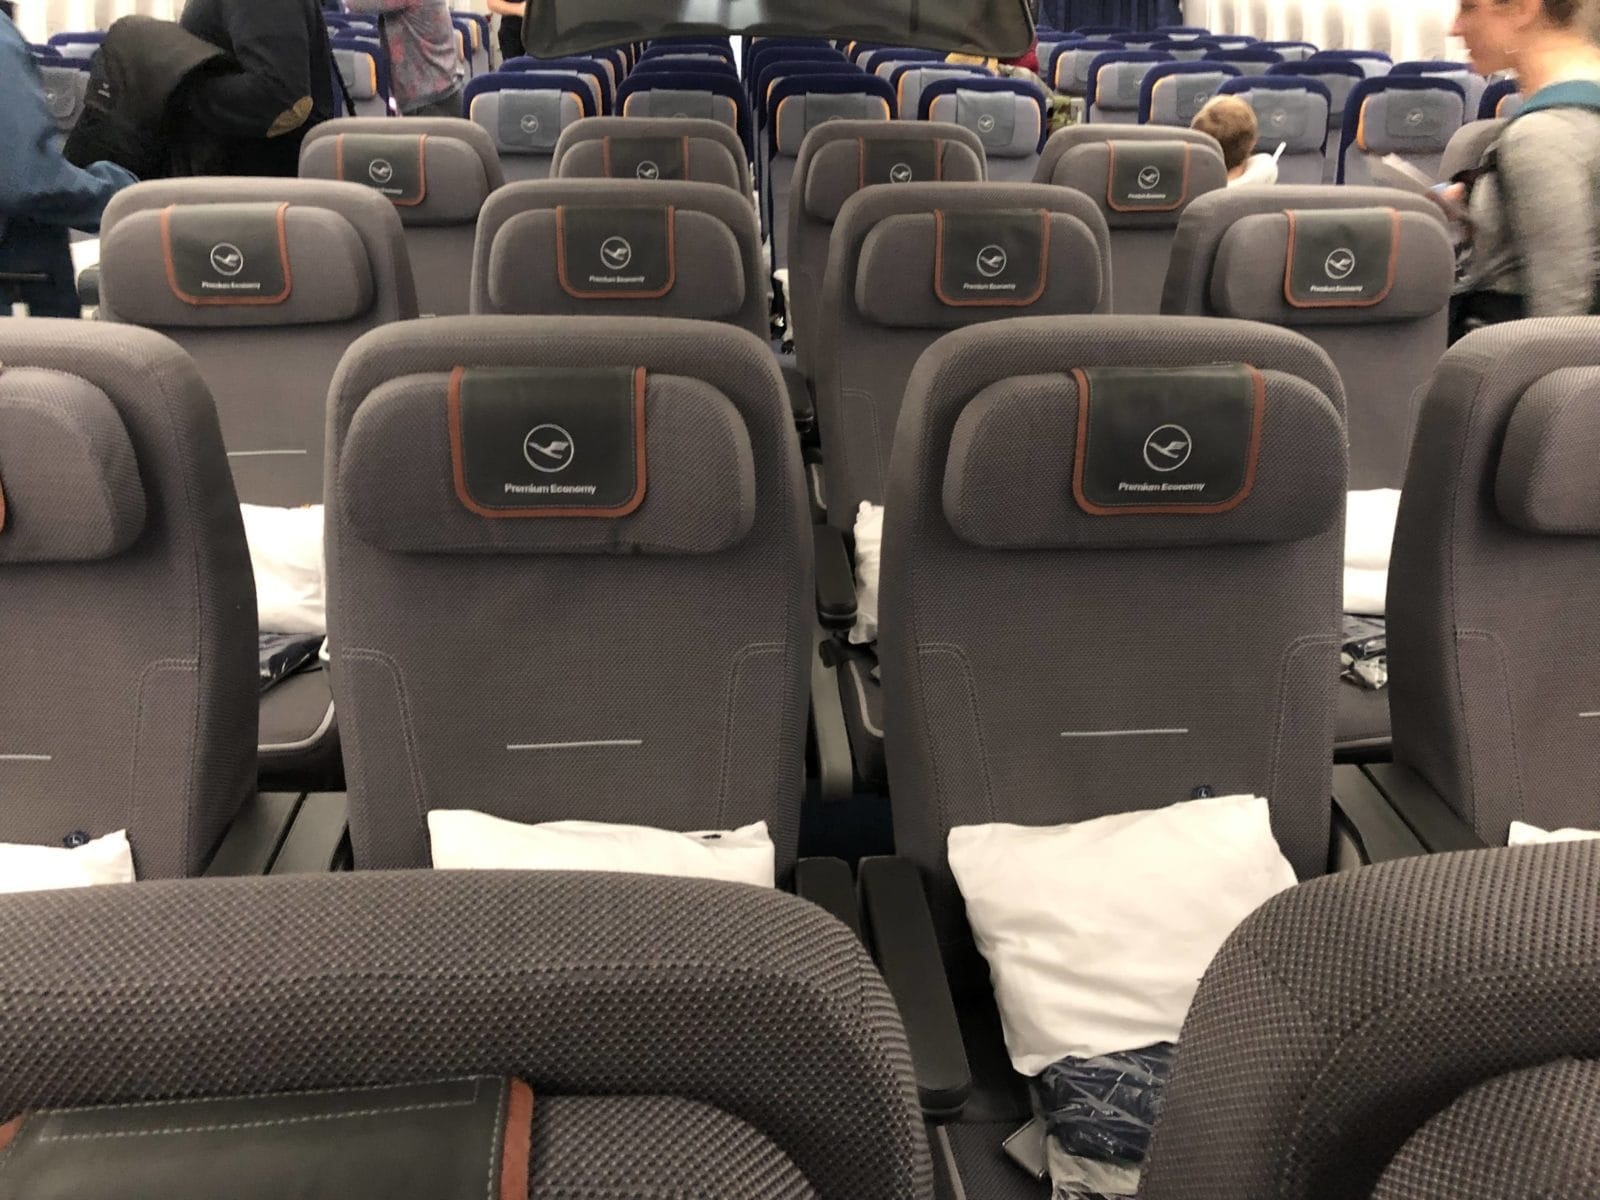 Lufthansa Premium Economy Boeing 747-8i Kabine